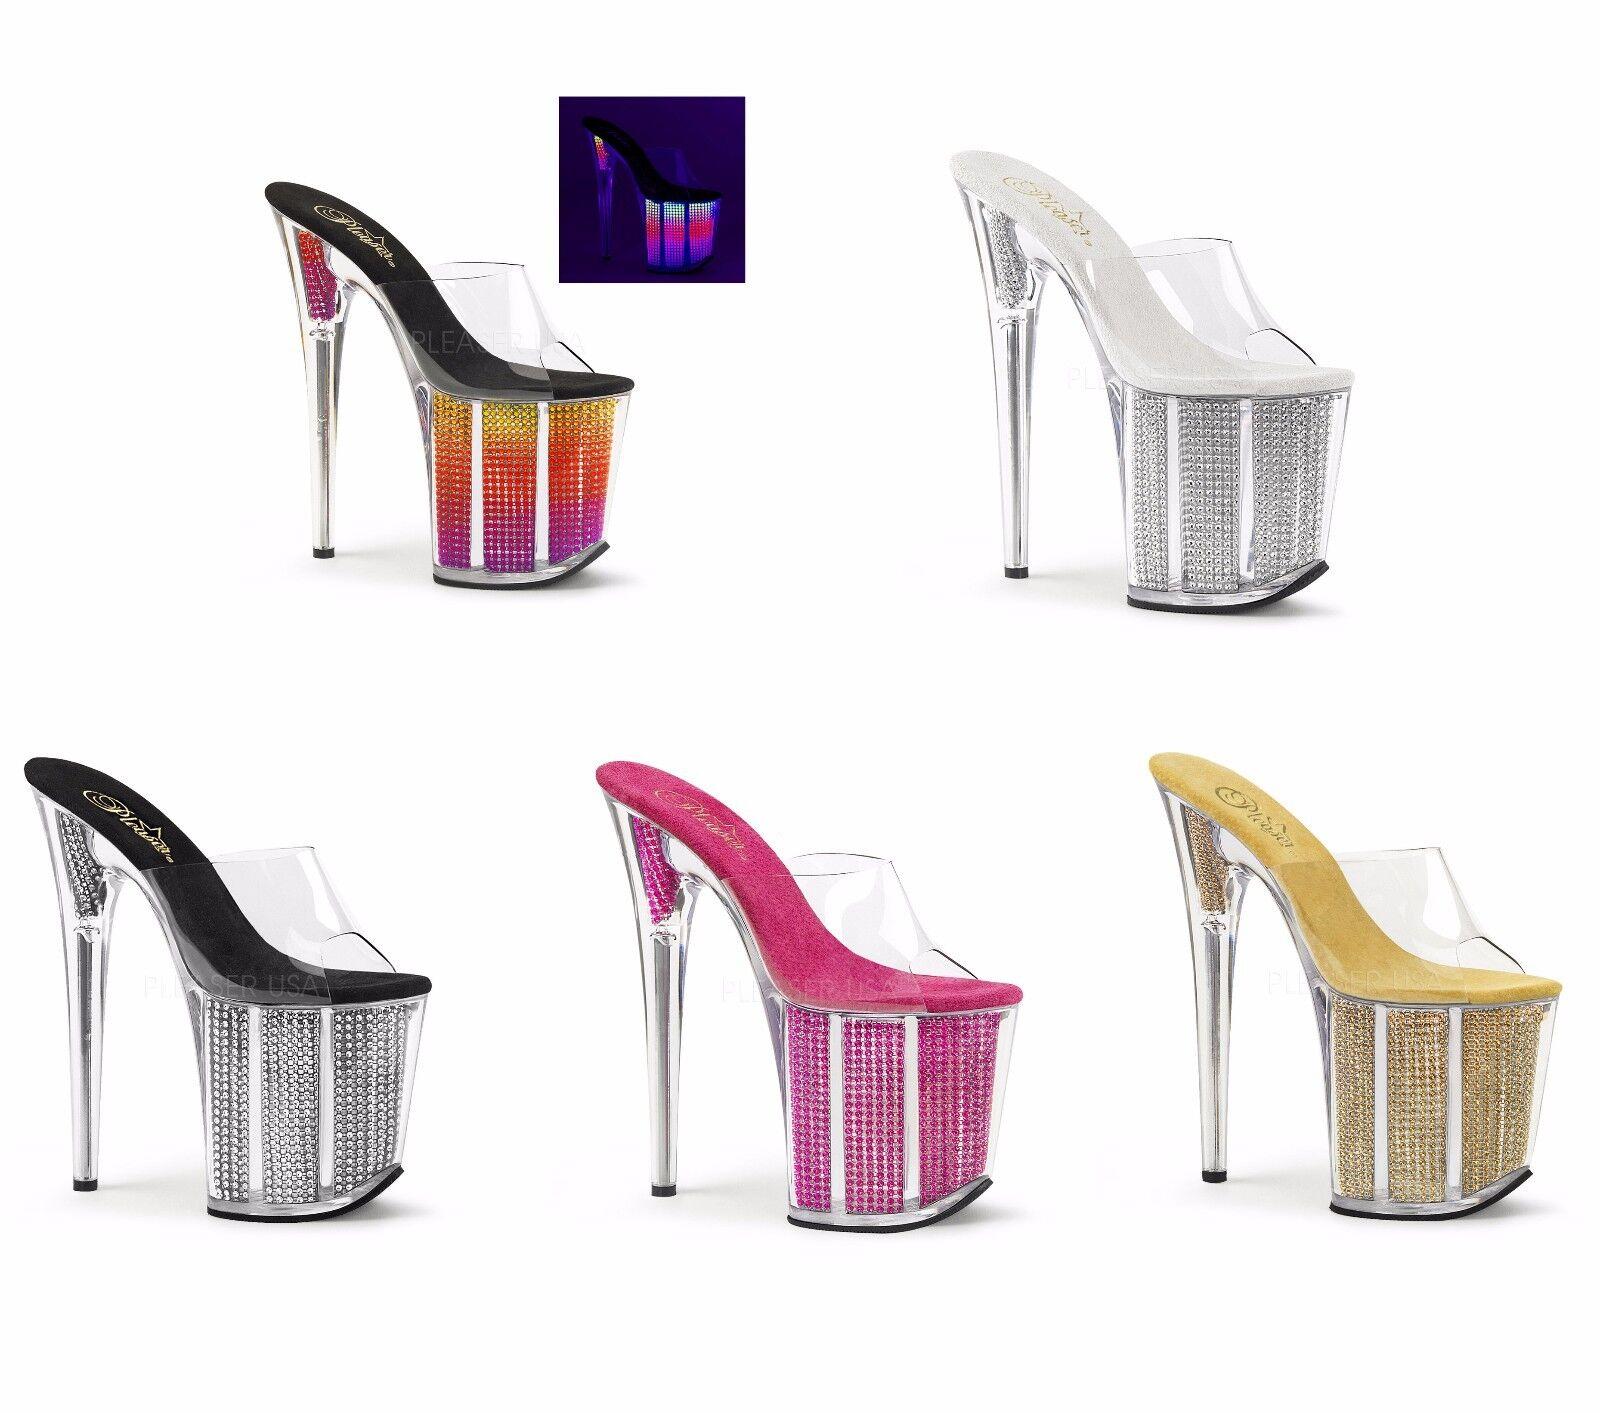 Pleaser Flamingo - 801SRS diapositiva diapositiva diapositiva de plataforma de baile exótico  buen precio